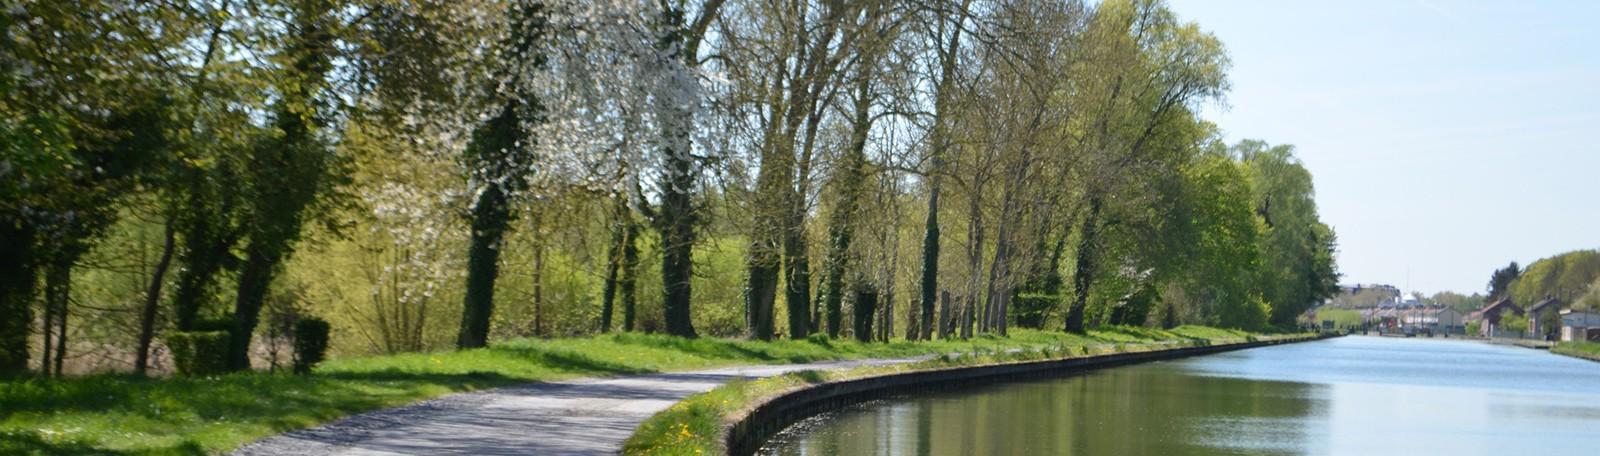 Car park Hôpital - Park in Saint-Quentin | Q-Park